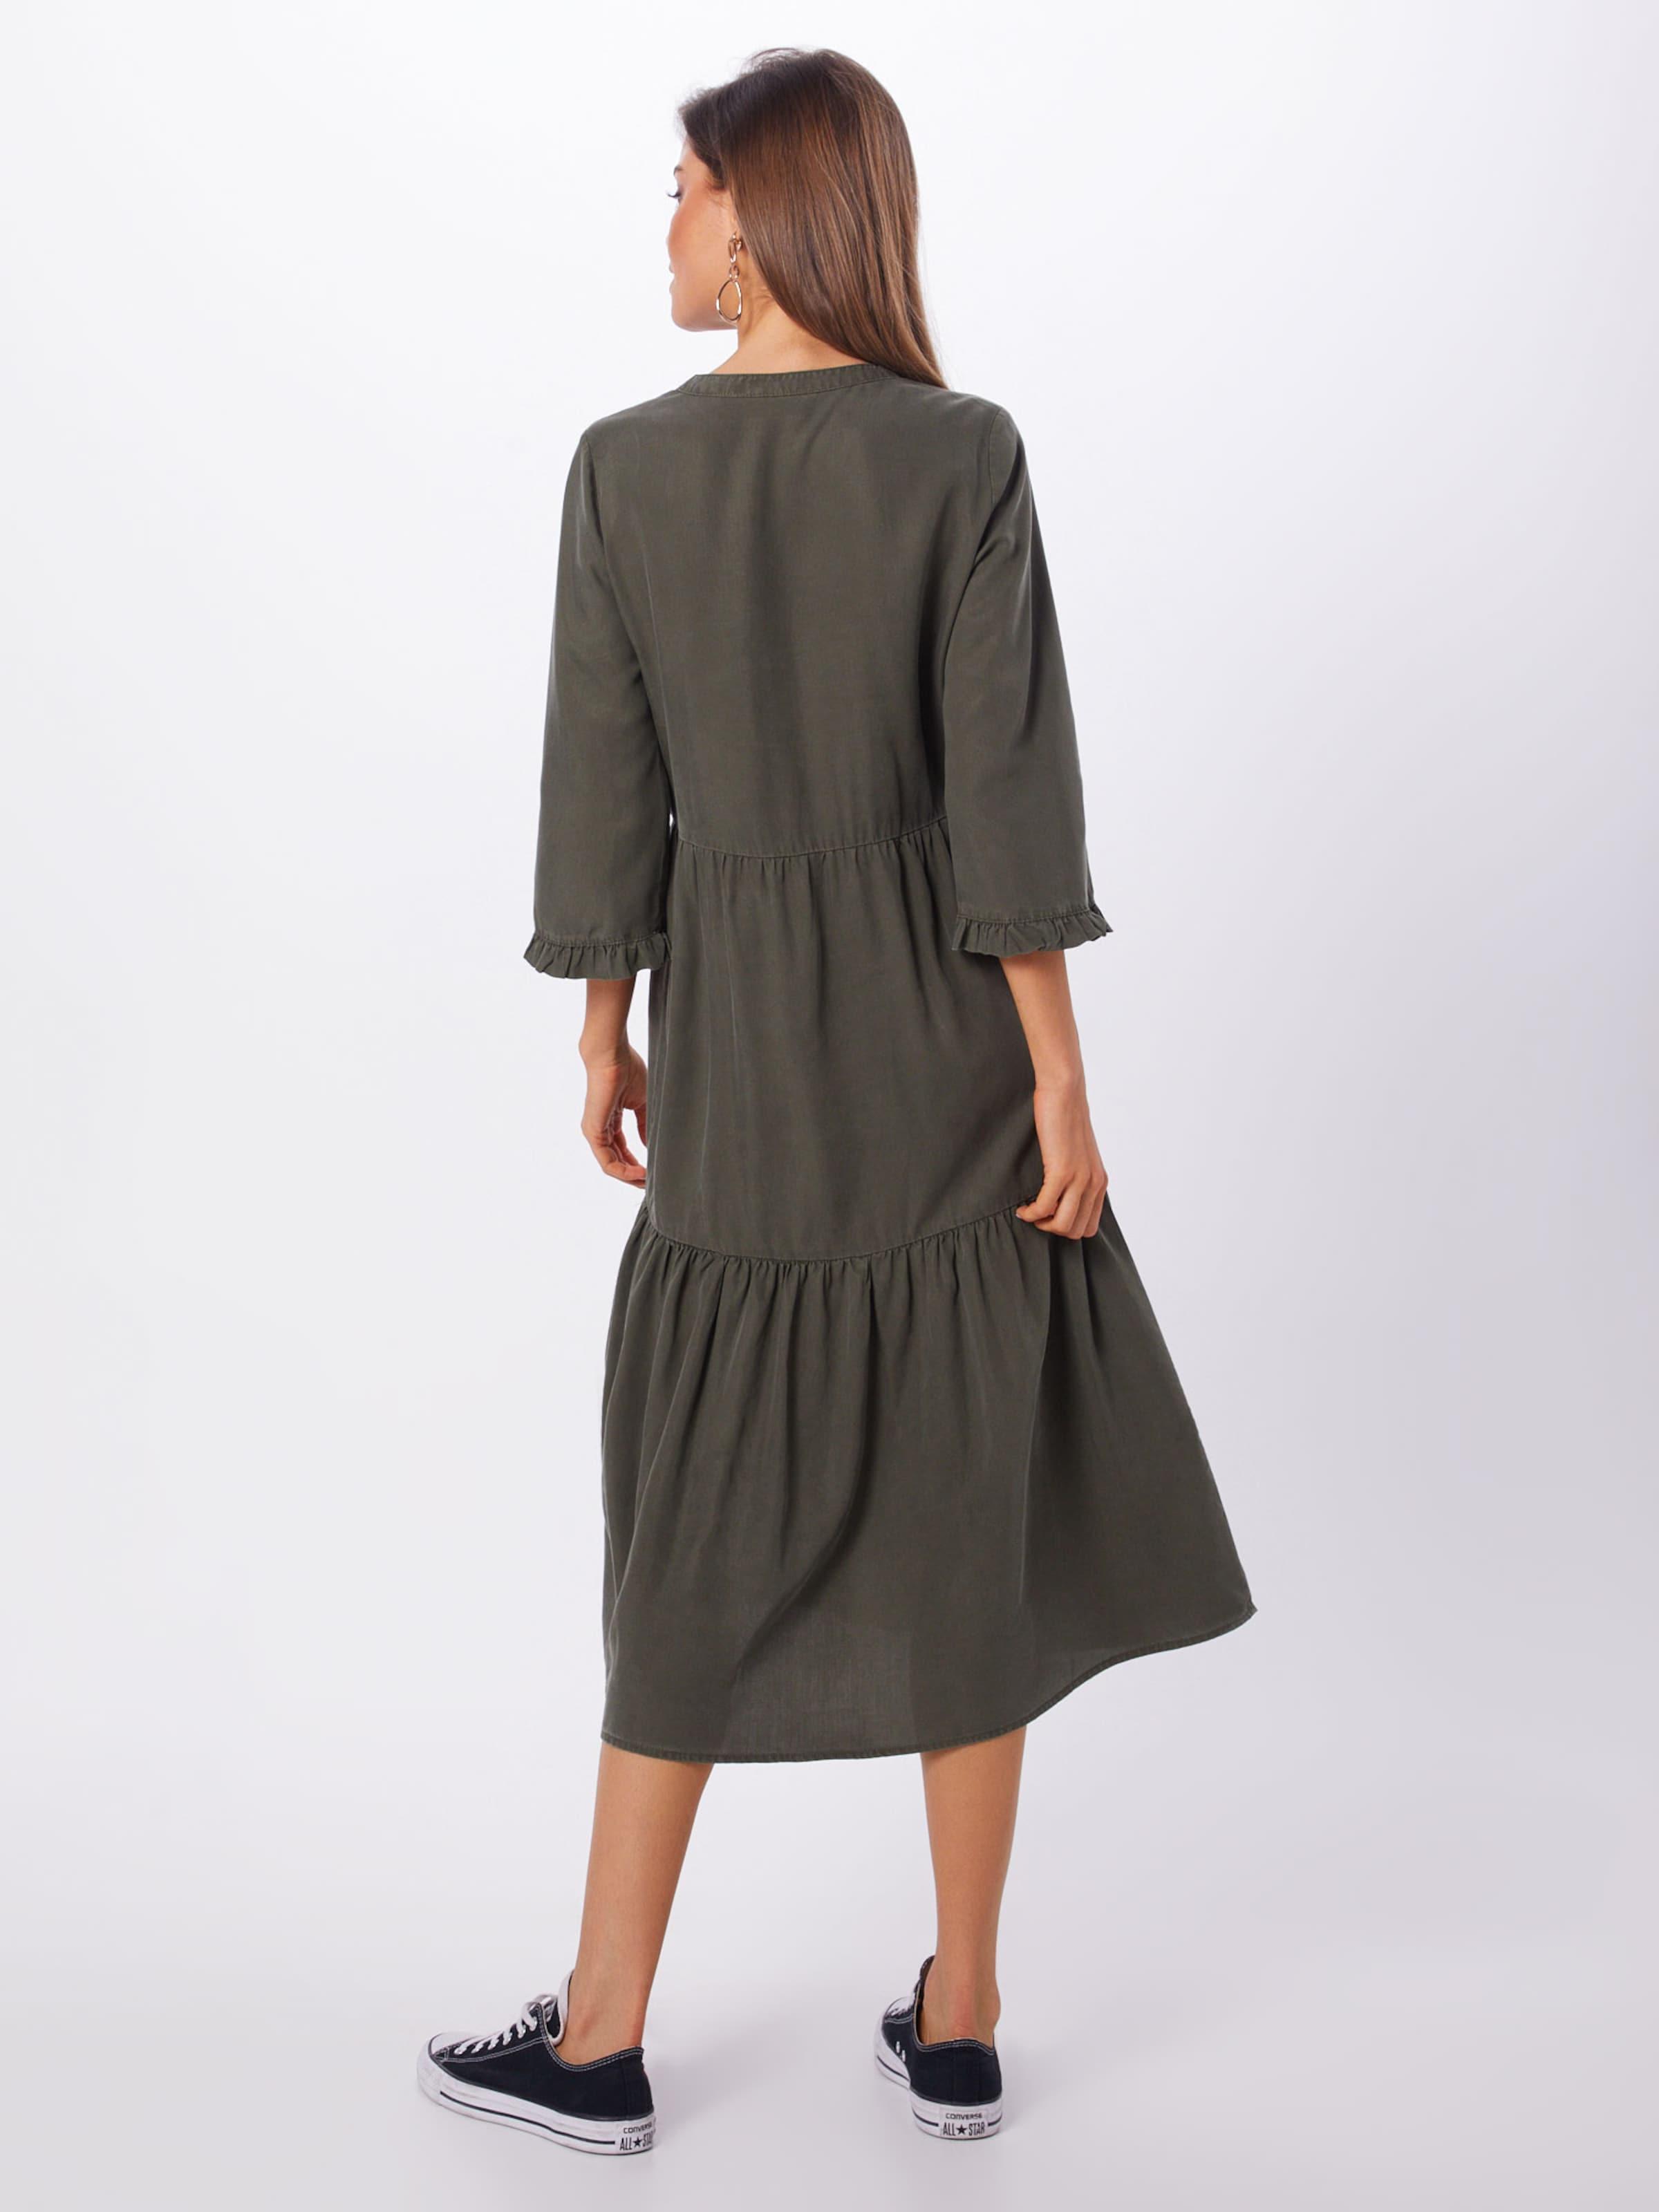 En chemise Robe Noisy Long 'nmendi Dress' Olive May 8wN0yOPvmn